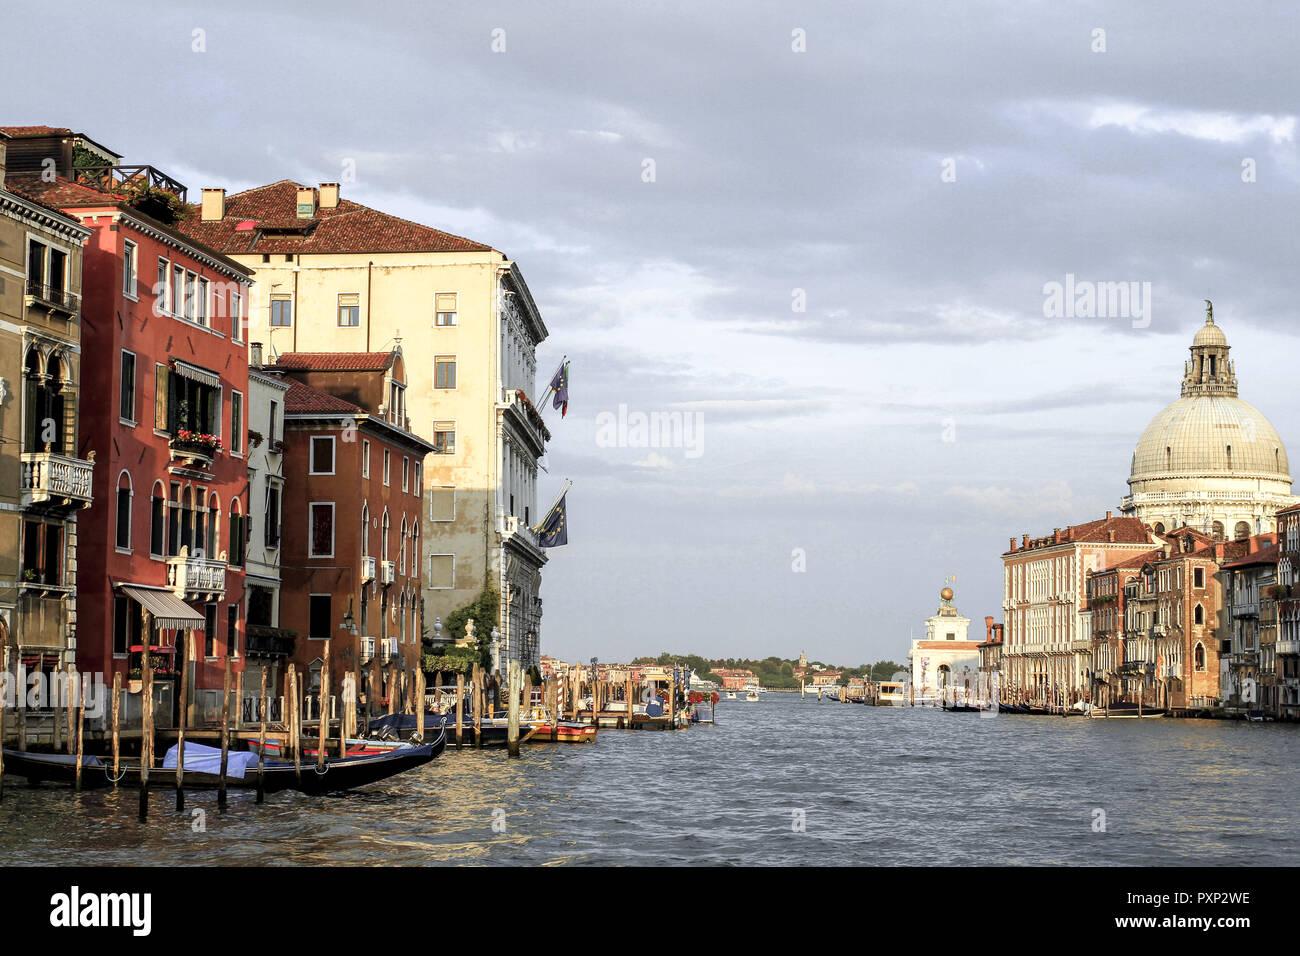 Canale Grande in Venedig, Italien Stock Photo